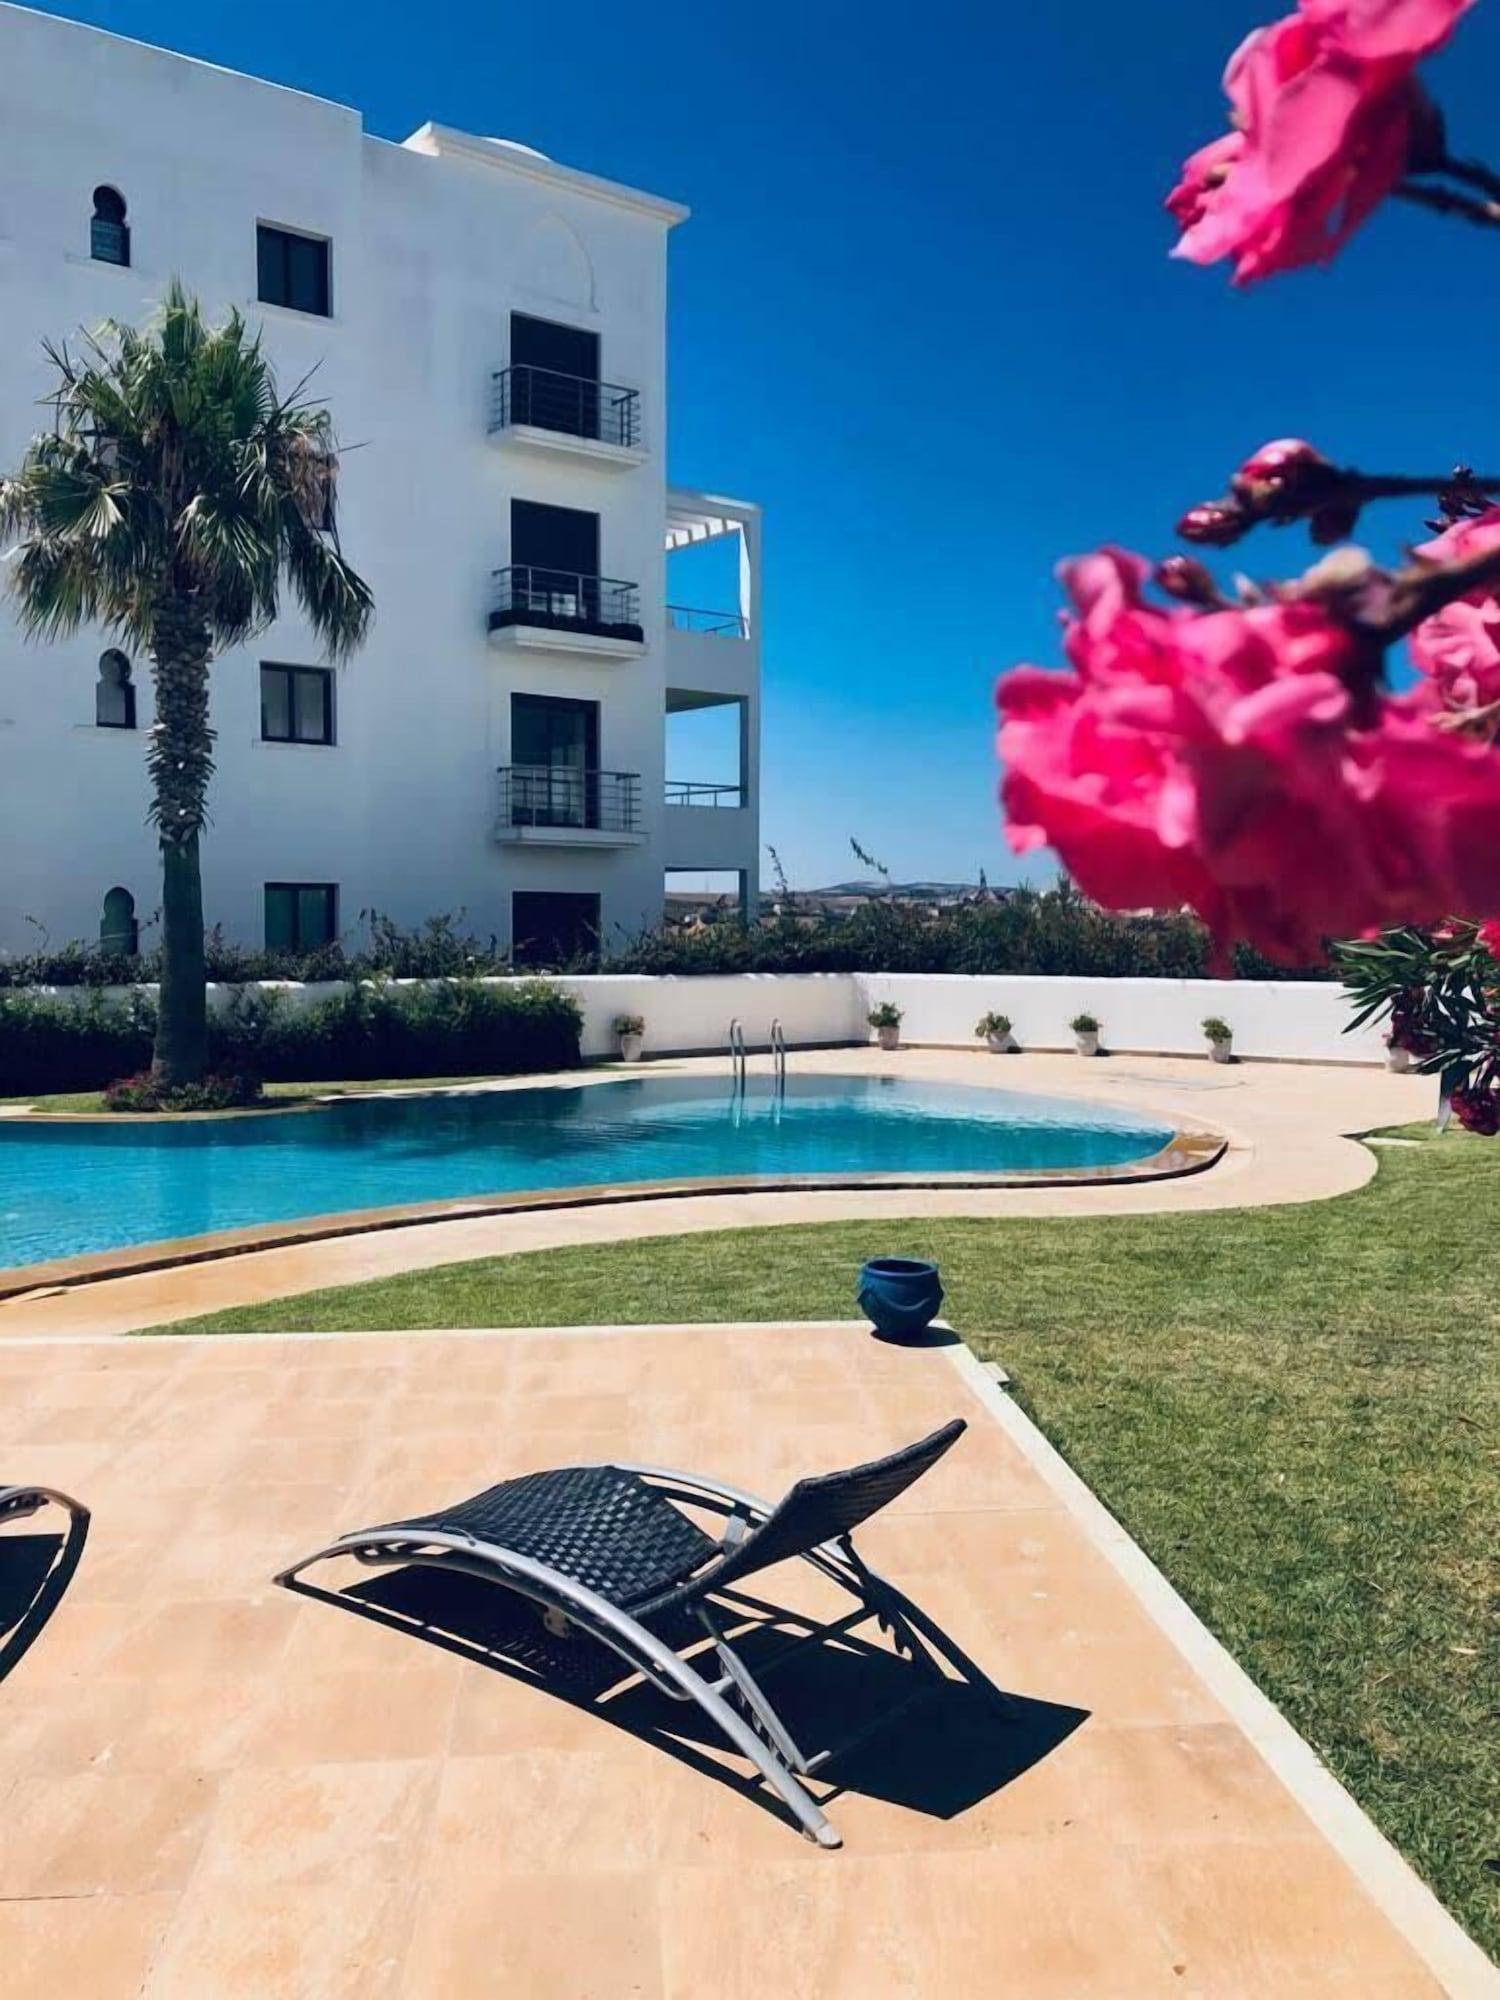 Les jardins d'Assilah Duplex, Tanger-Assilah